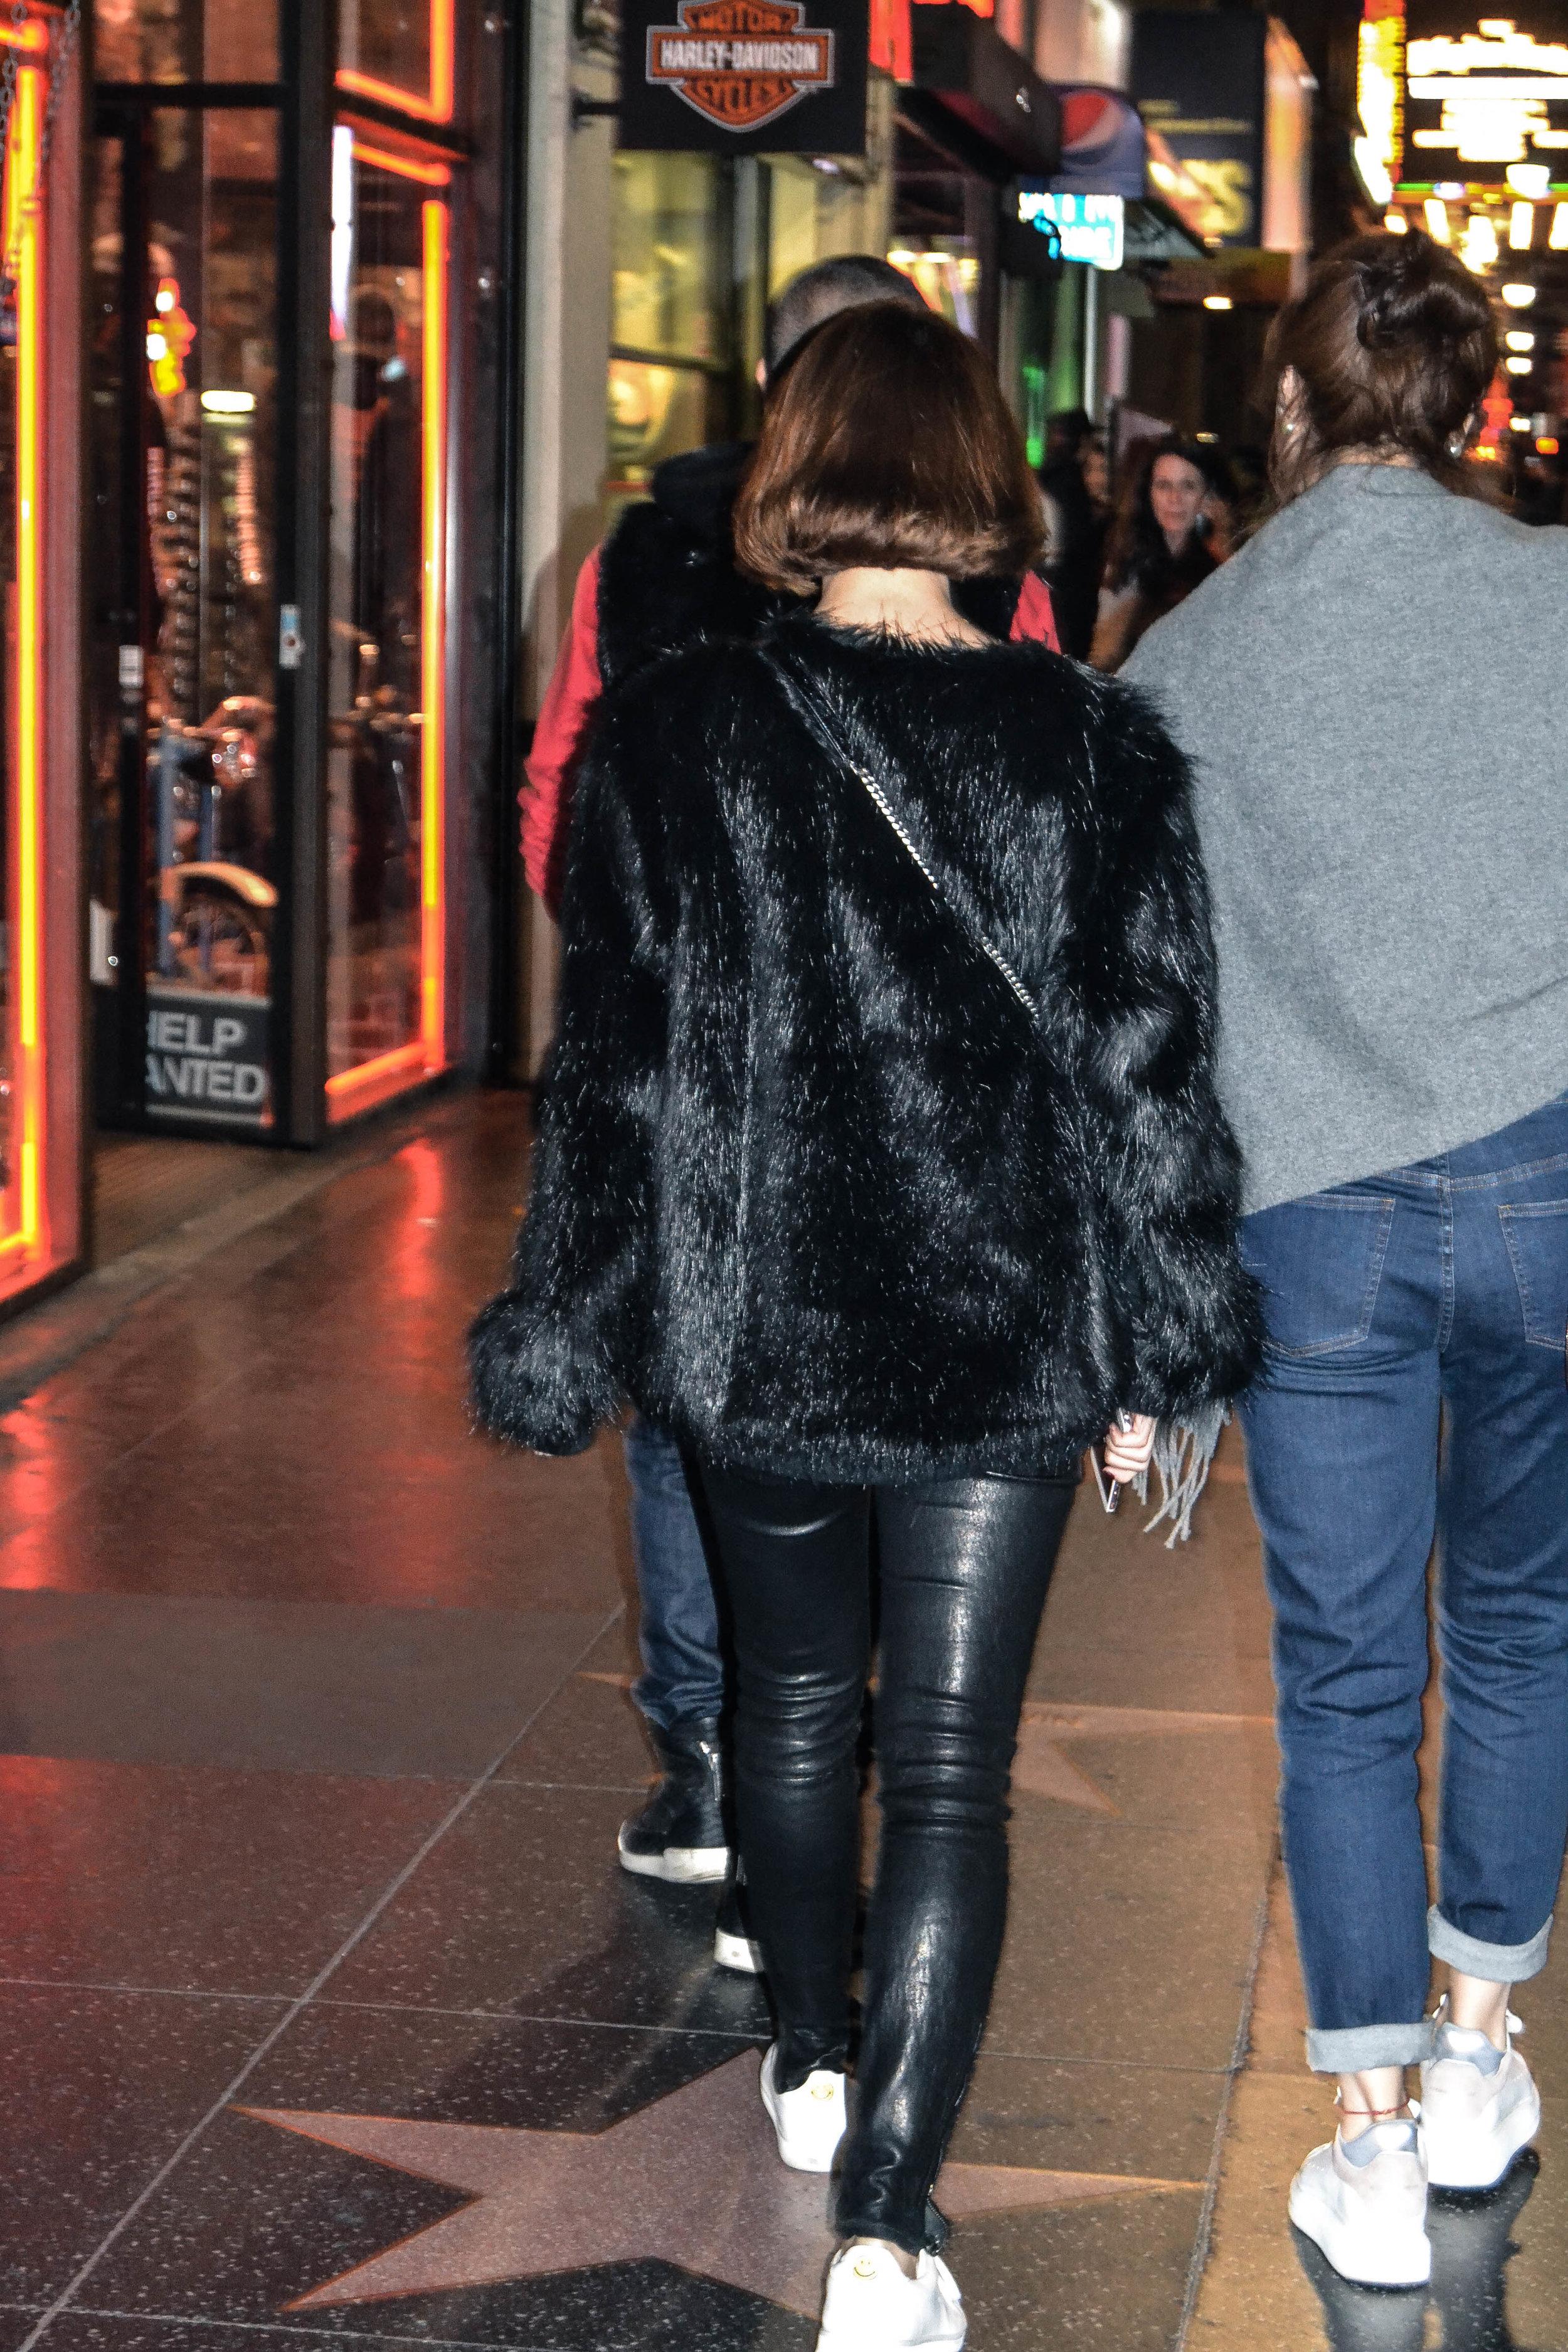 fashion-travel-los-angeles-stylist-blogger-illy-perez20.jpg